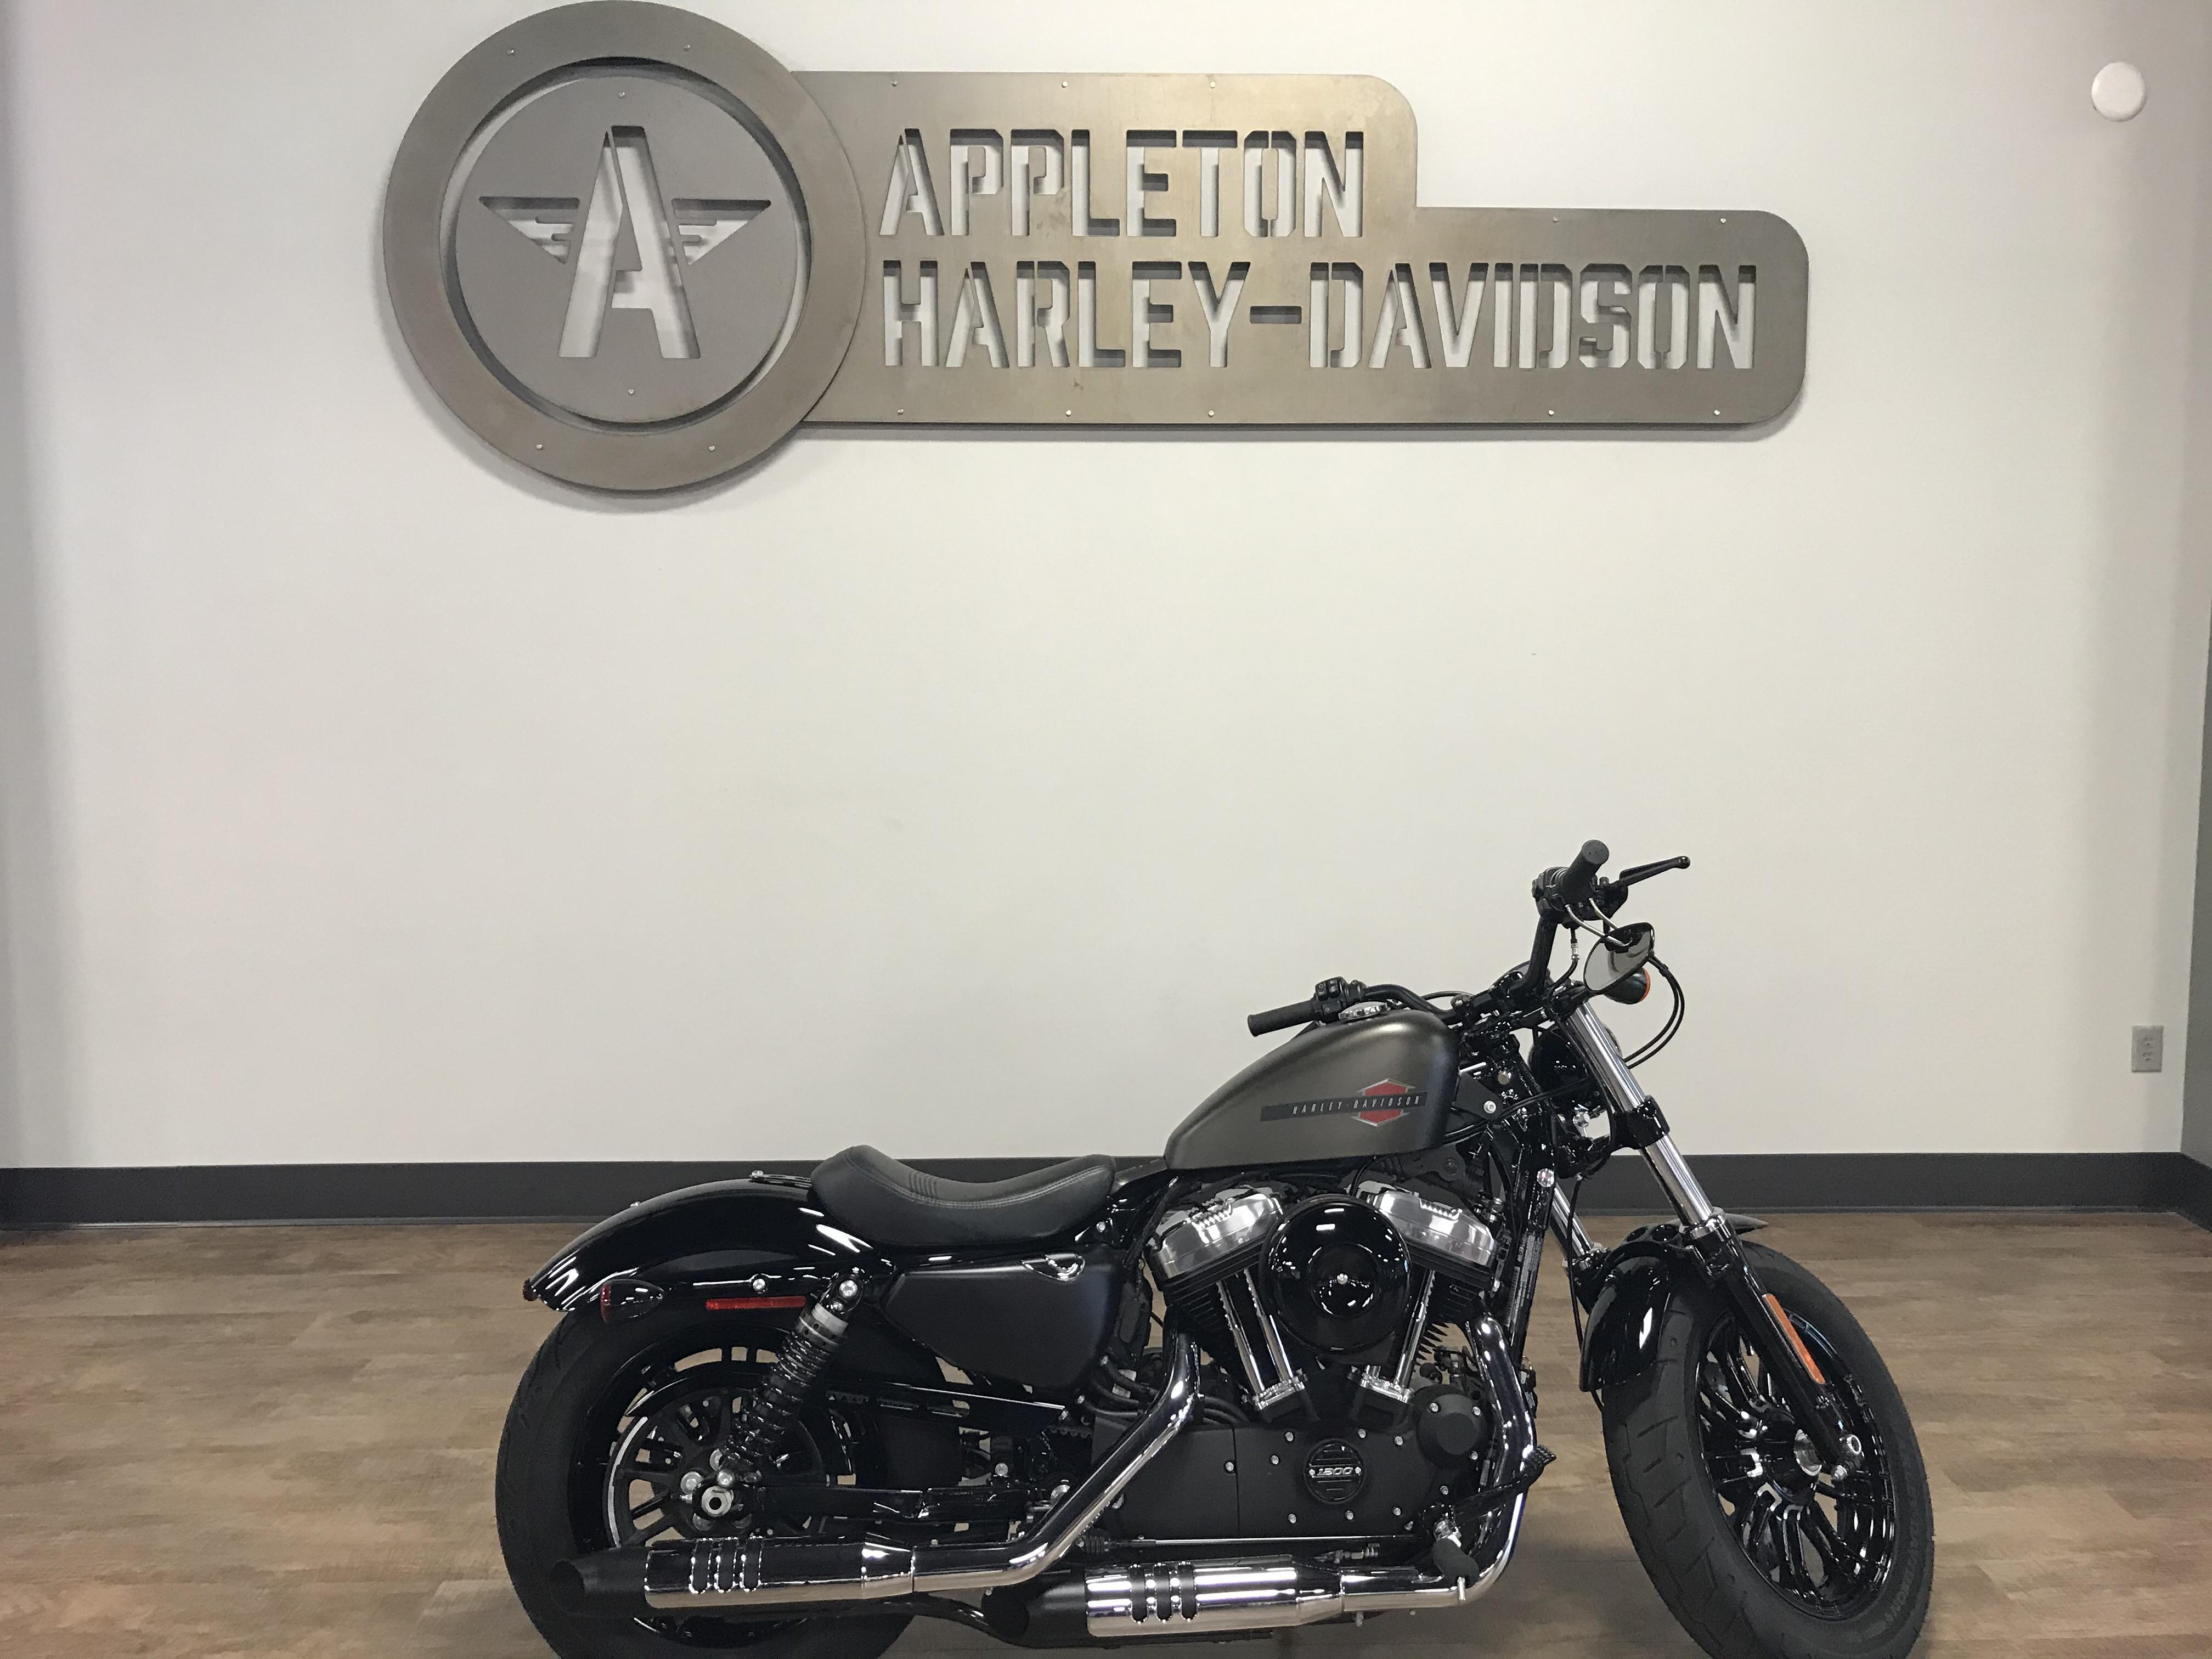 2020 Harley-Davidson [1]